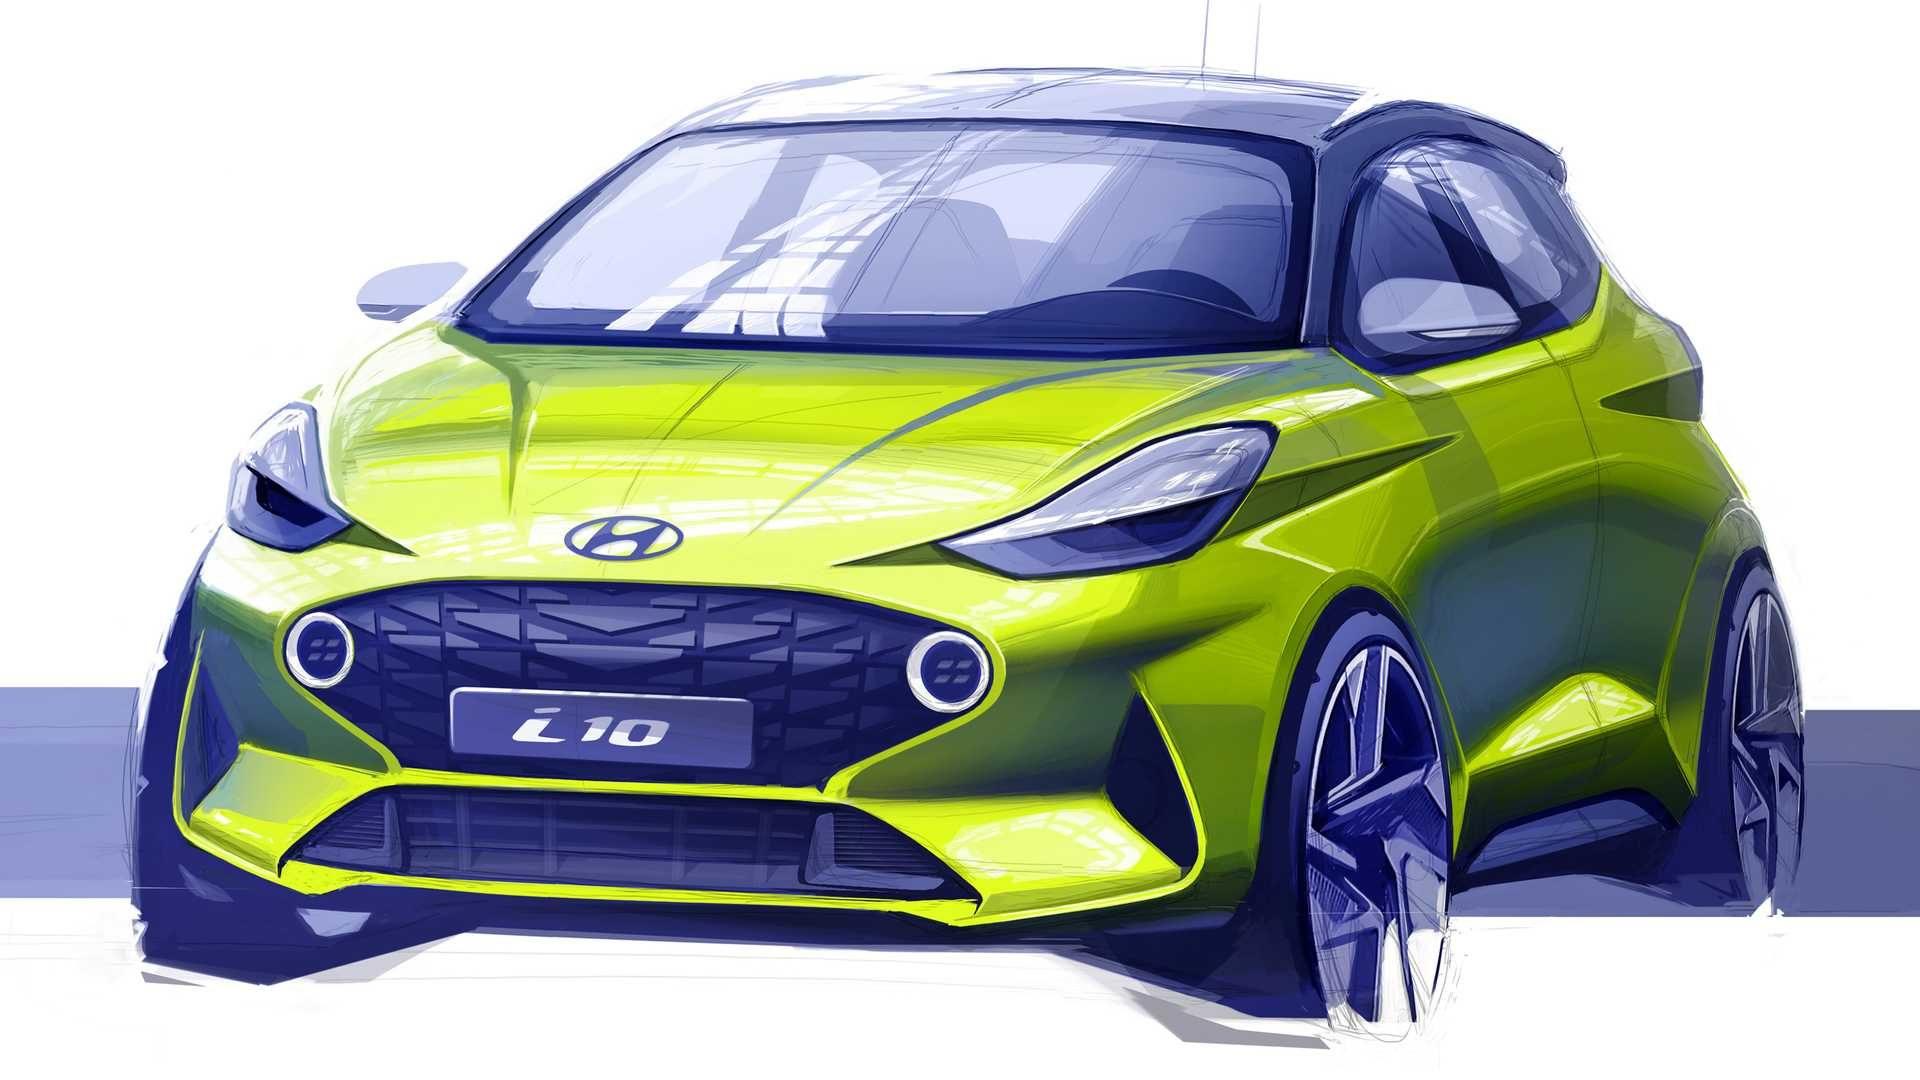 Hyundai Electric car teaser